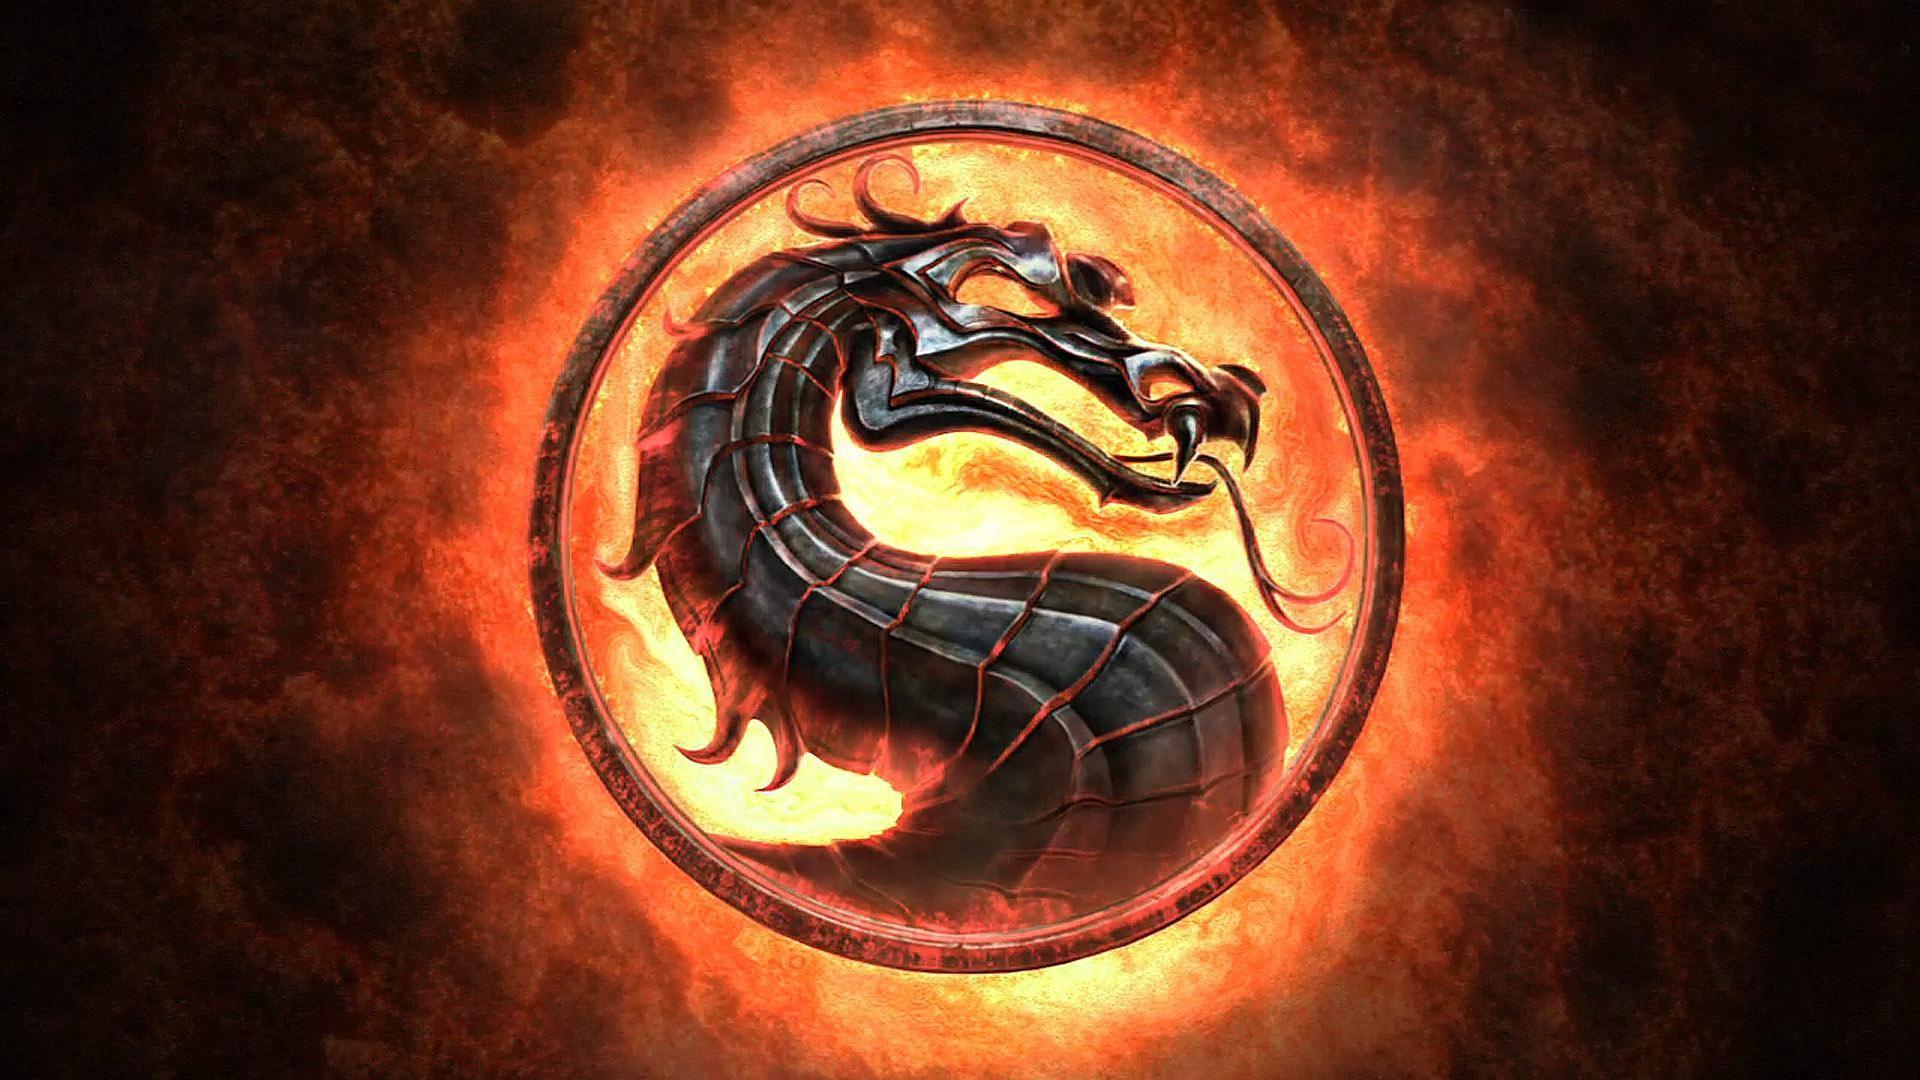 Mortal Kombat Wallpaper Hd Jpeg Jpeg Image 1920 1080 Pixels Scaled 83 Mortal Kombat Gambar Naga Gambar